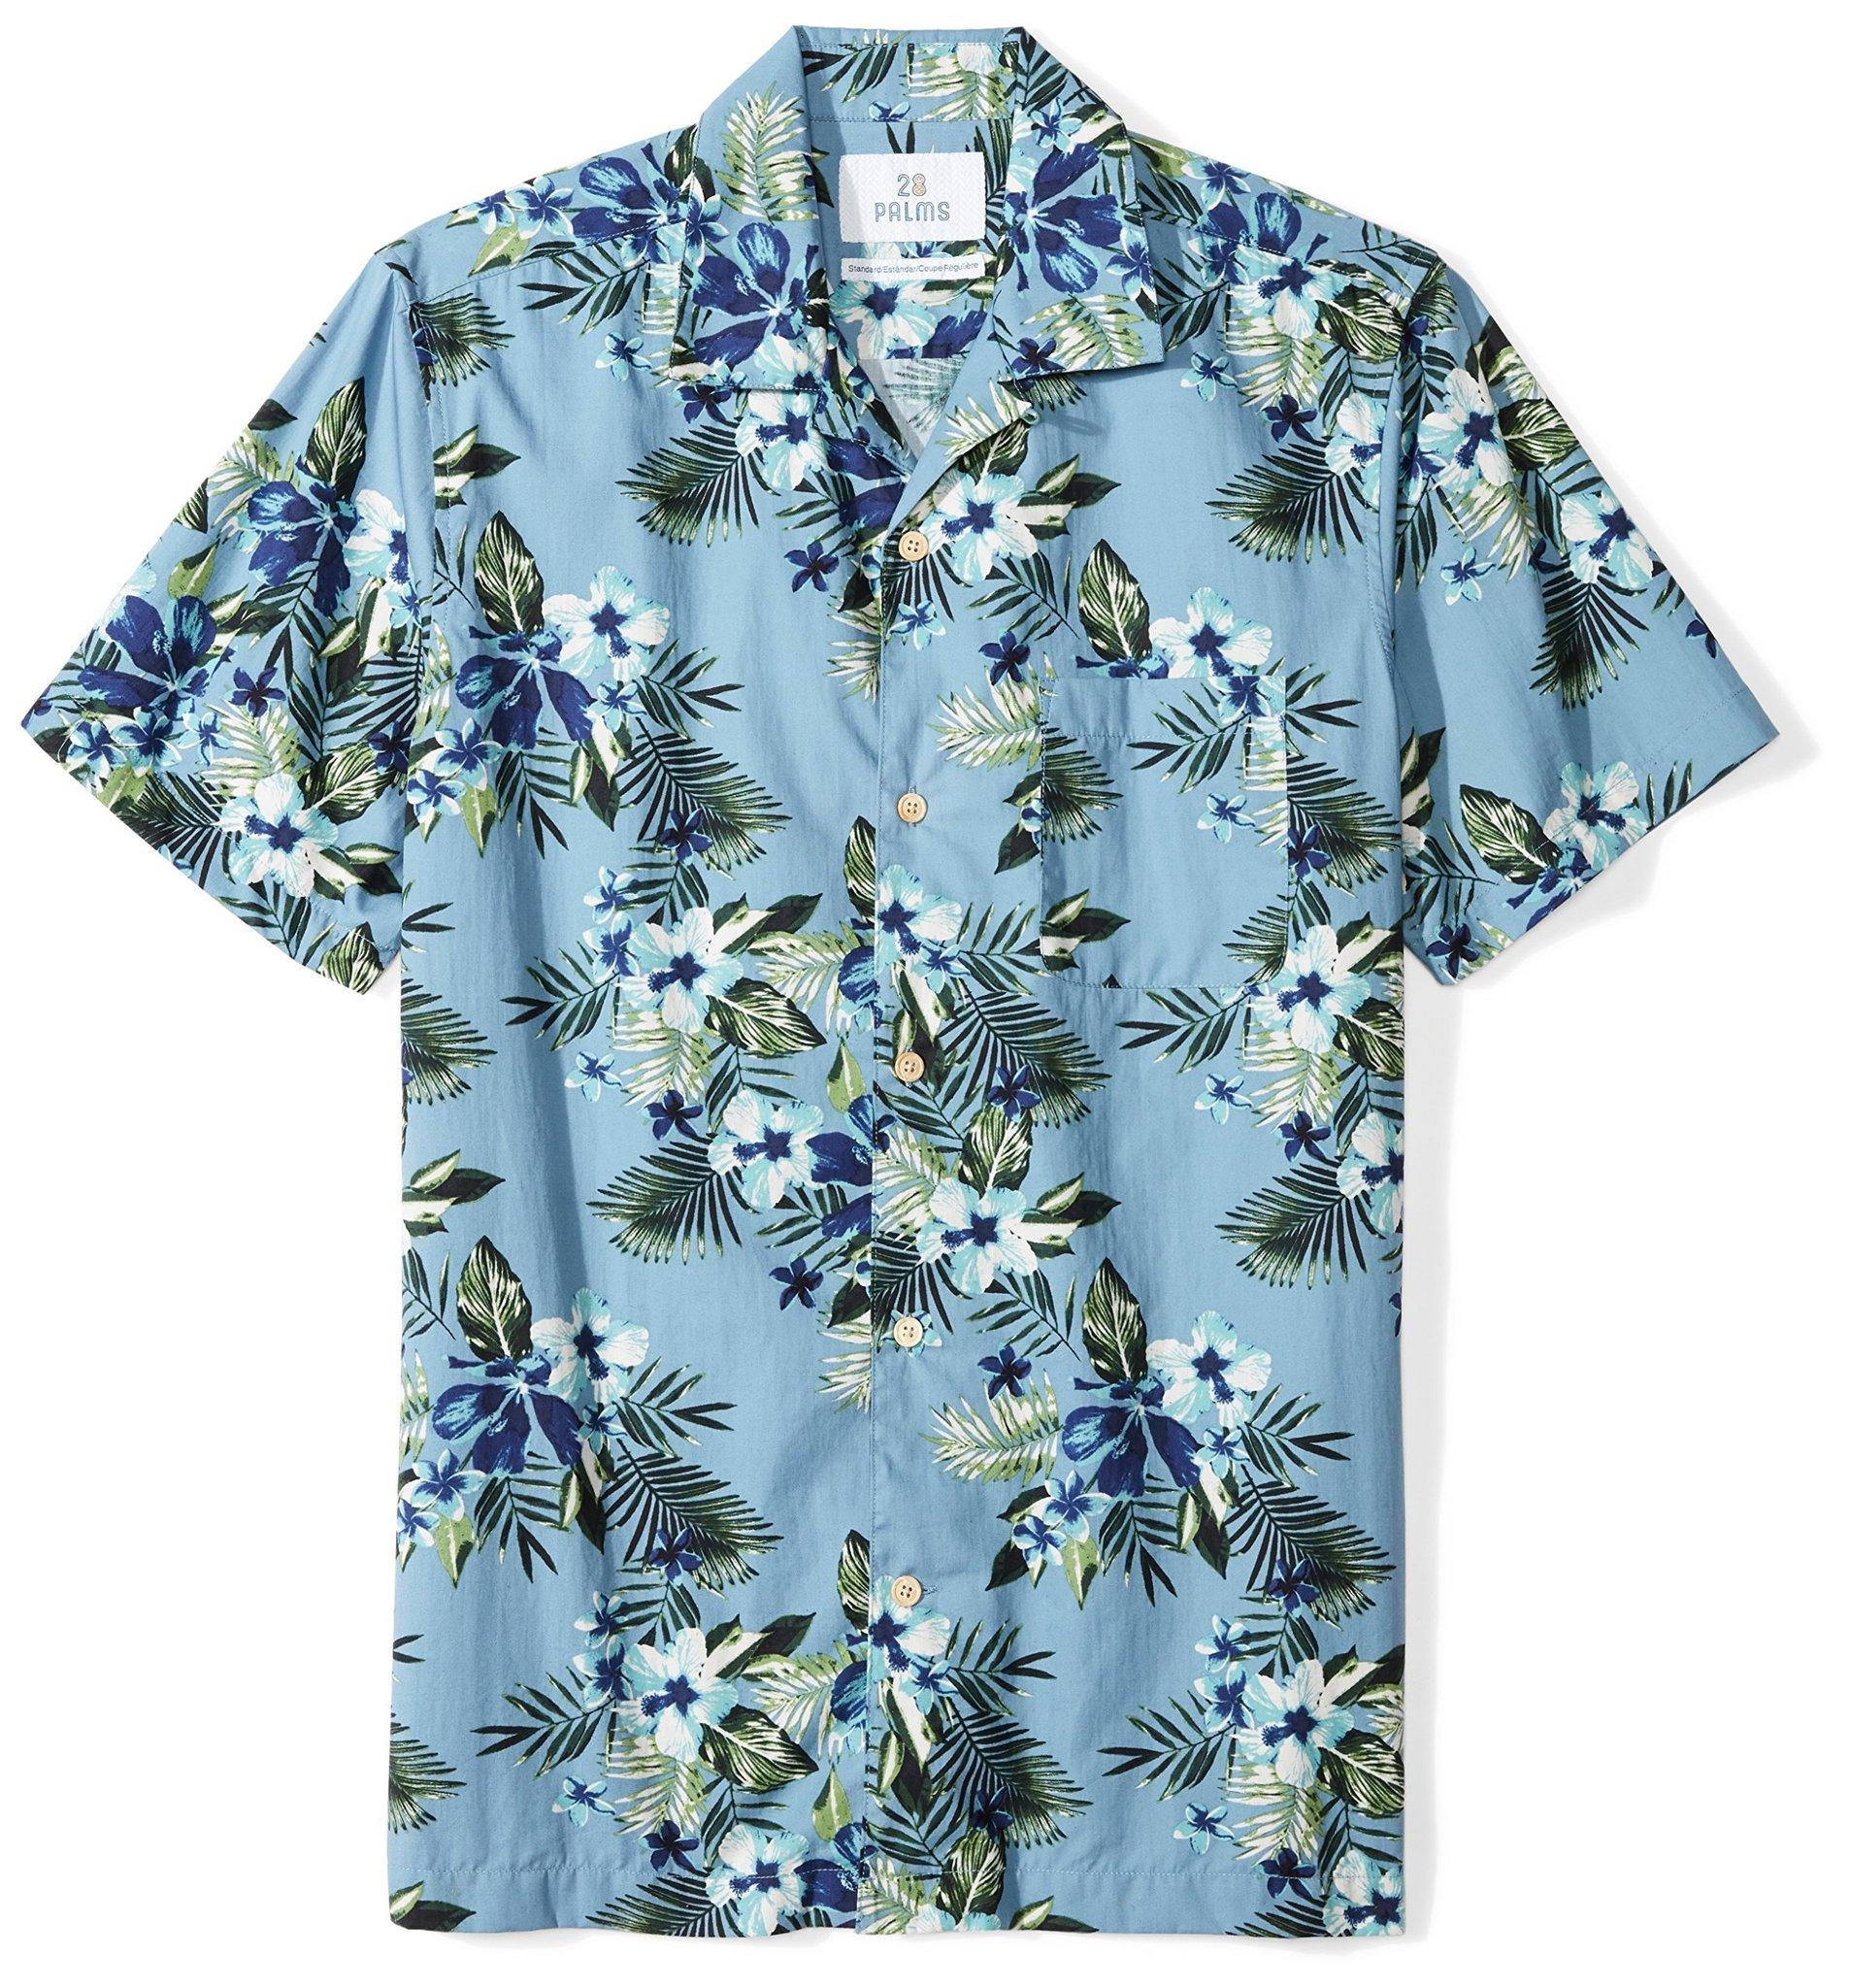 [special edition] floral tropical hawaiian shirt - Maria